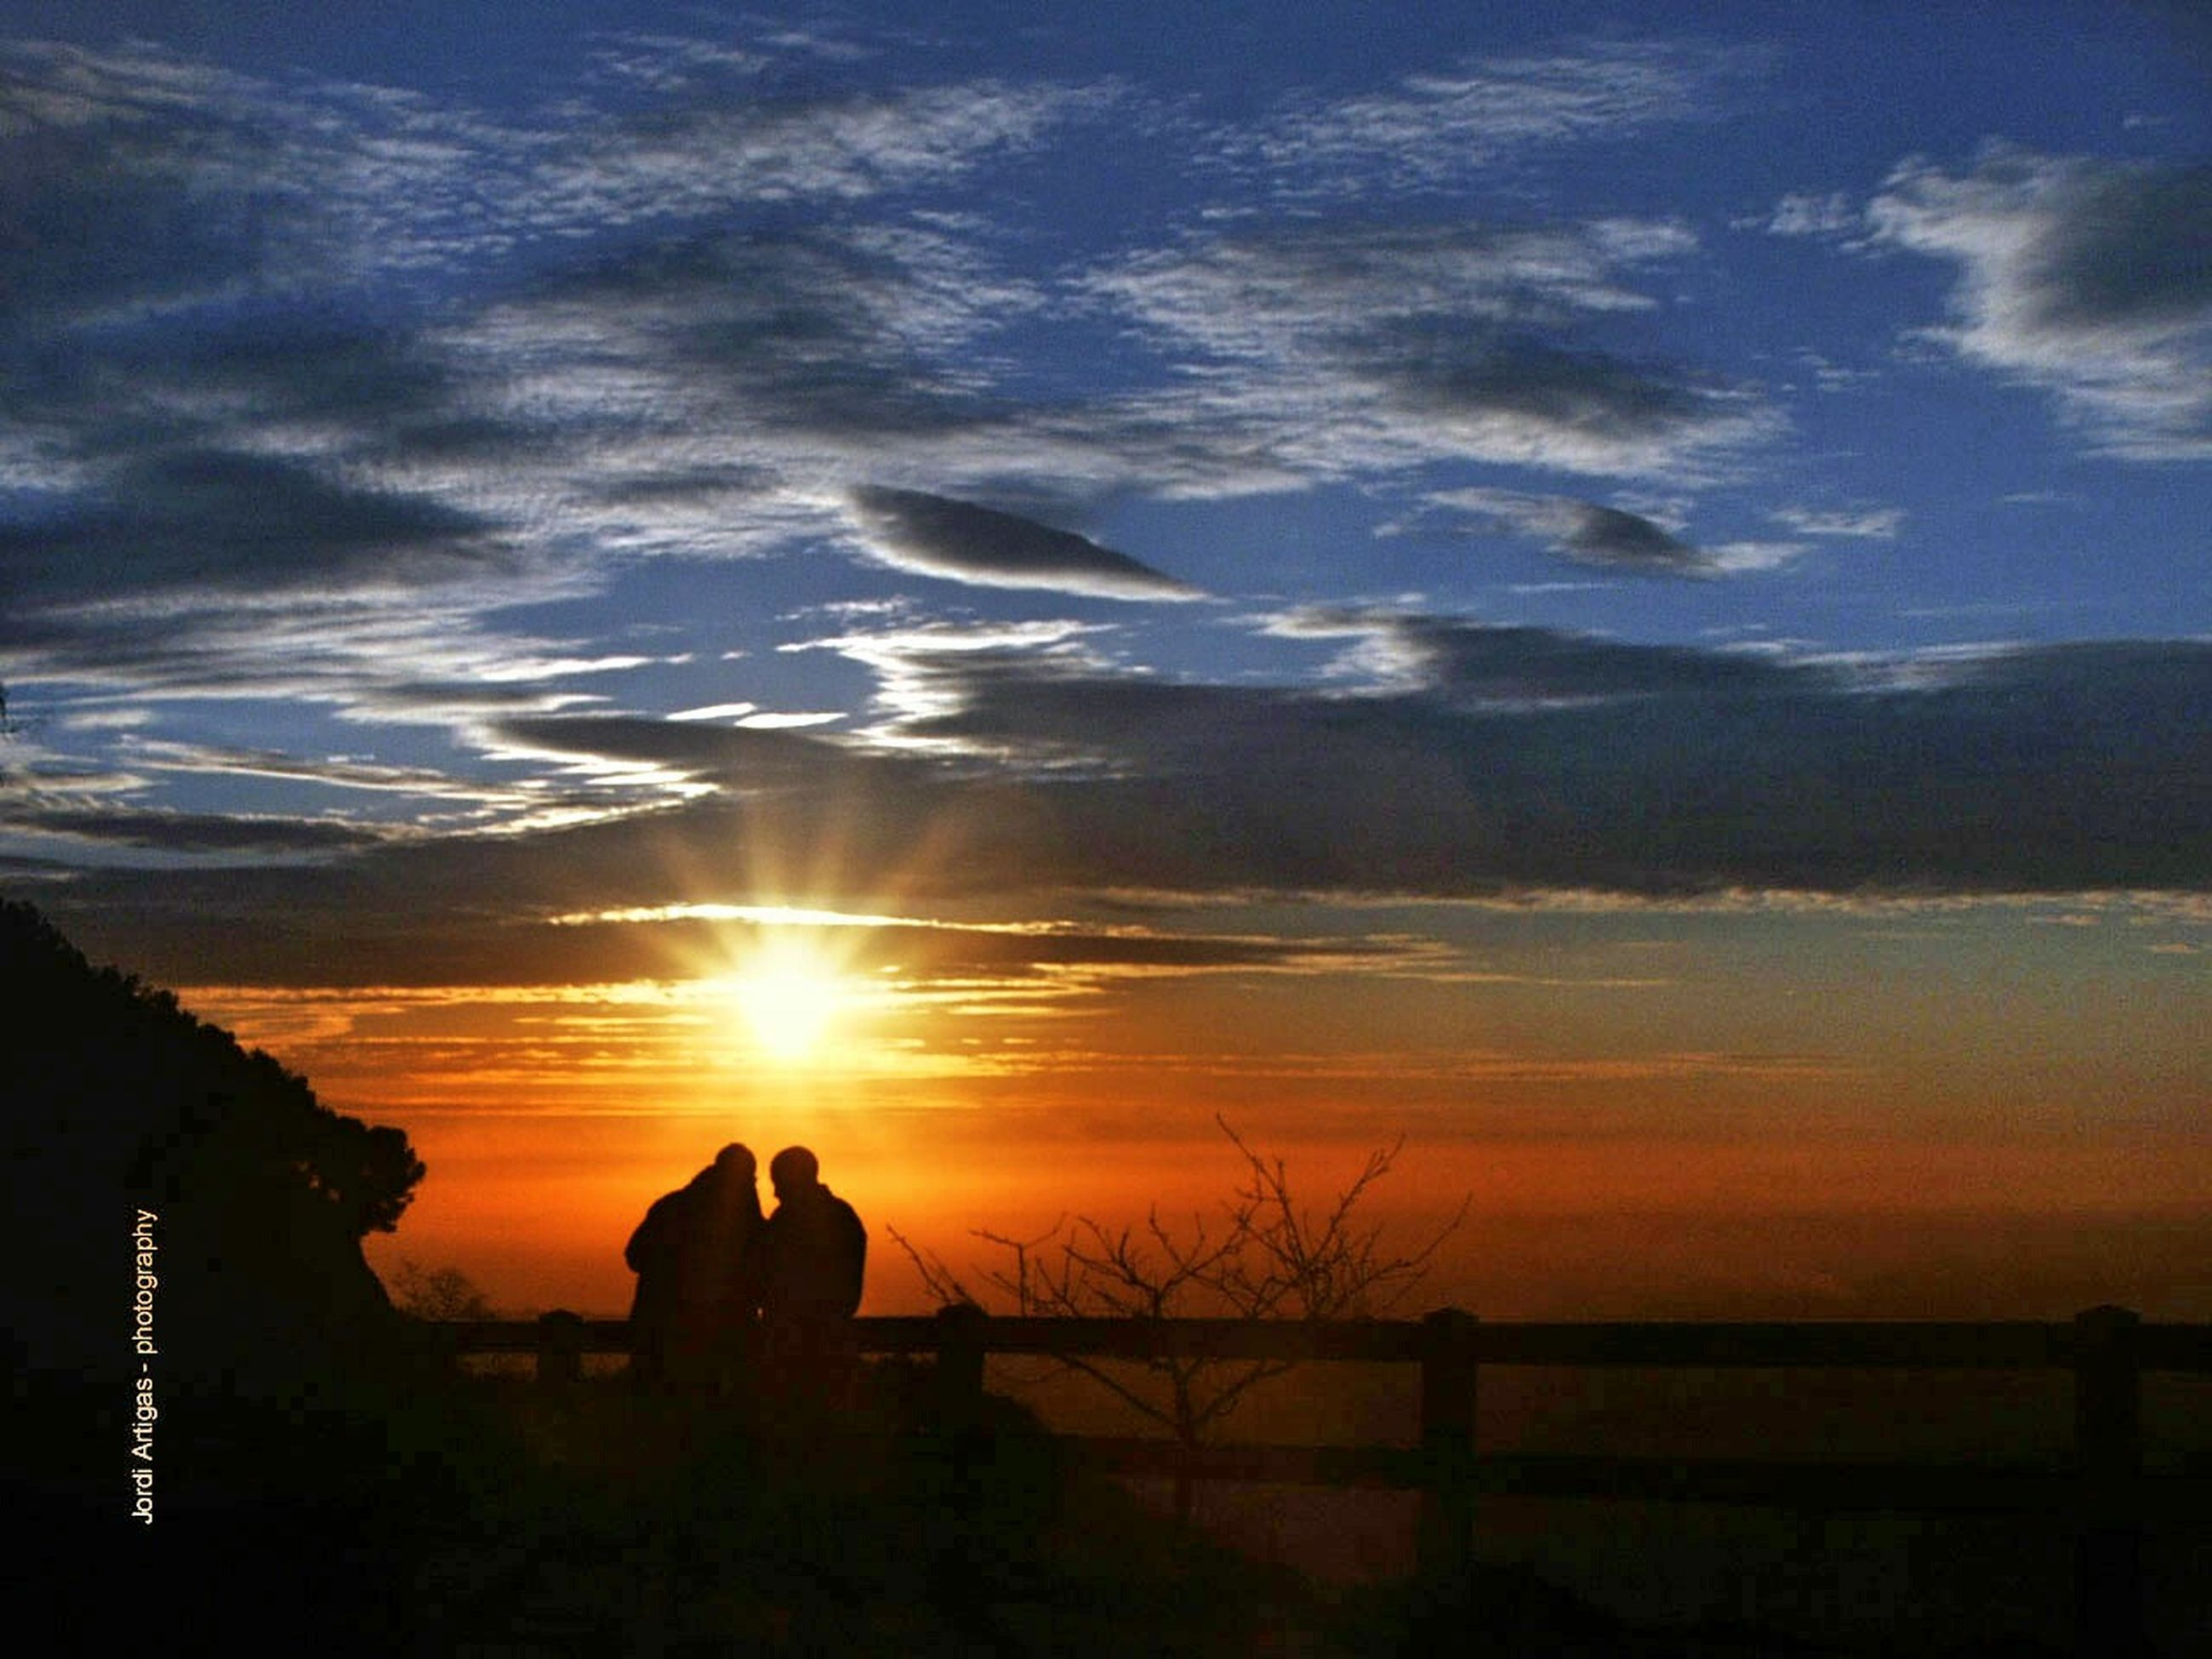 sunset, silhouette, tranquil scene, scenics, sky, tranquility, beauty in nature, sun, nature, idyllic, orange color, water, cloud - sky, sea, sunlight, cloud, outdoors, non-urban scene, landscape, no people